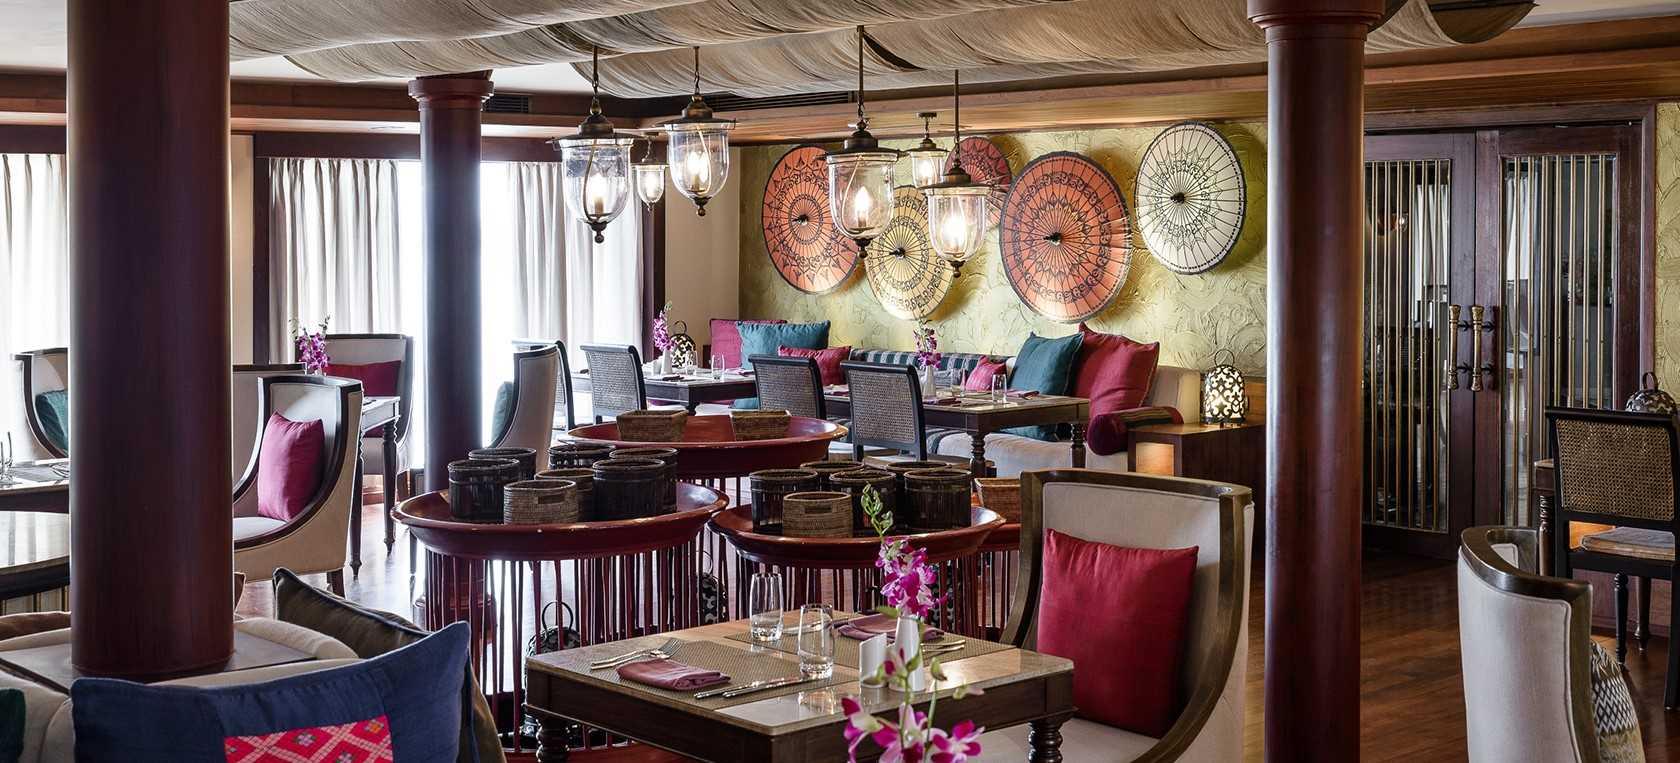 Sanctuary Ananda Lounge